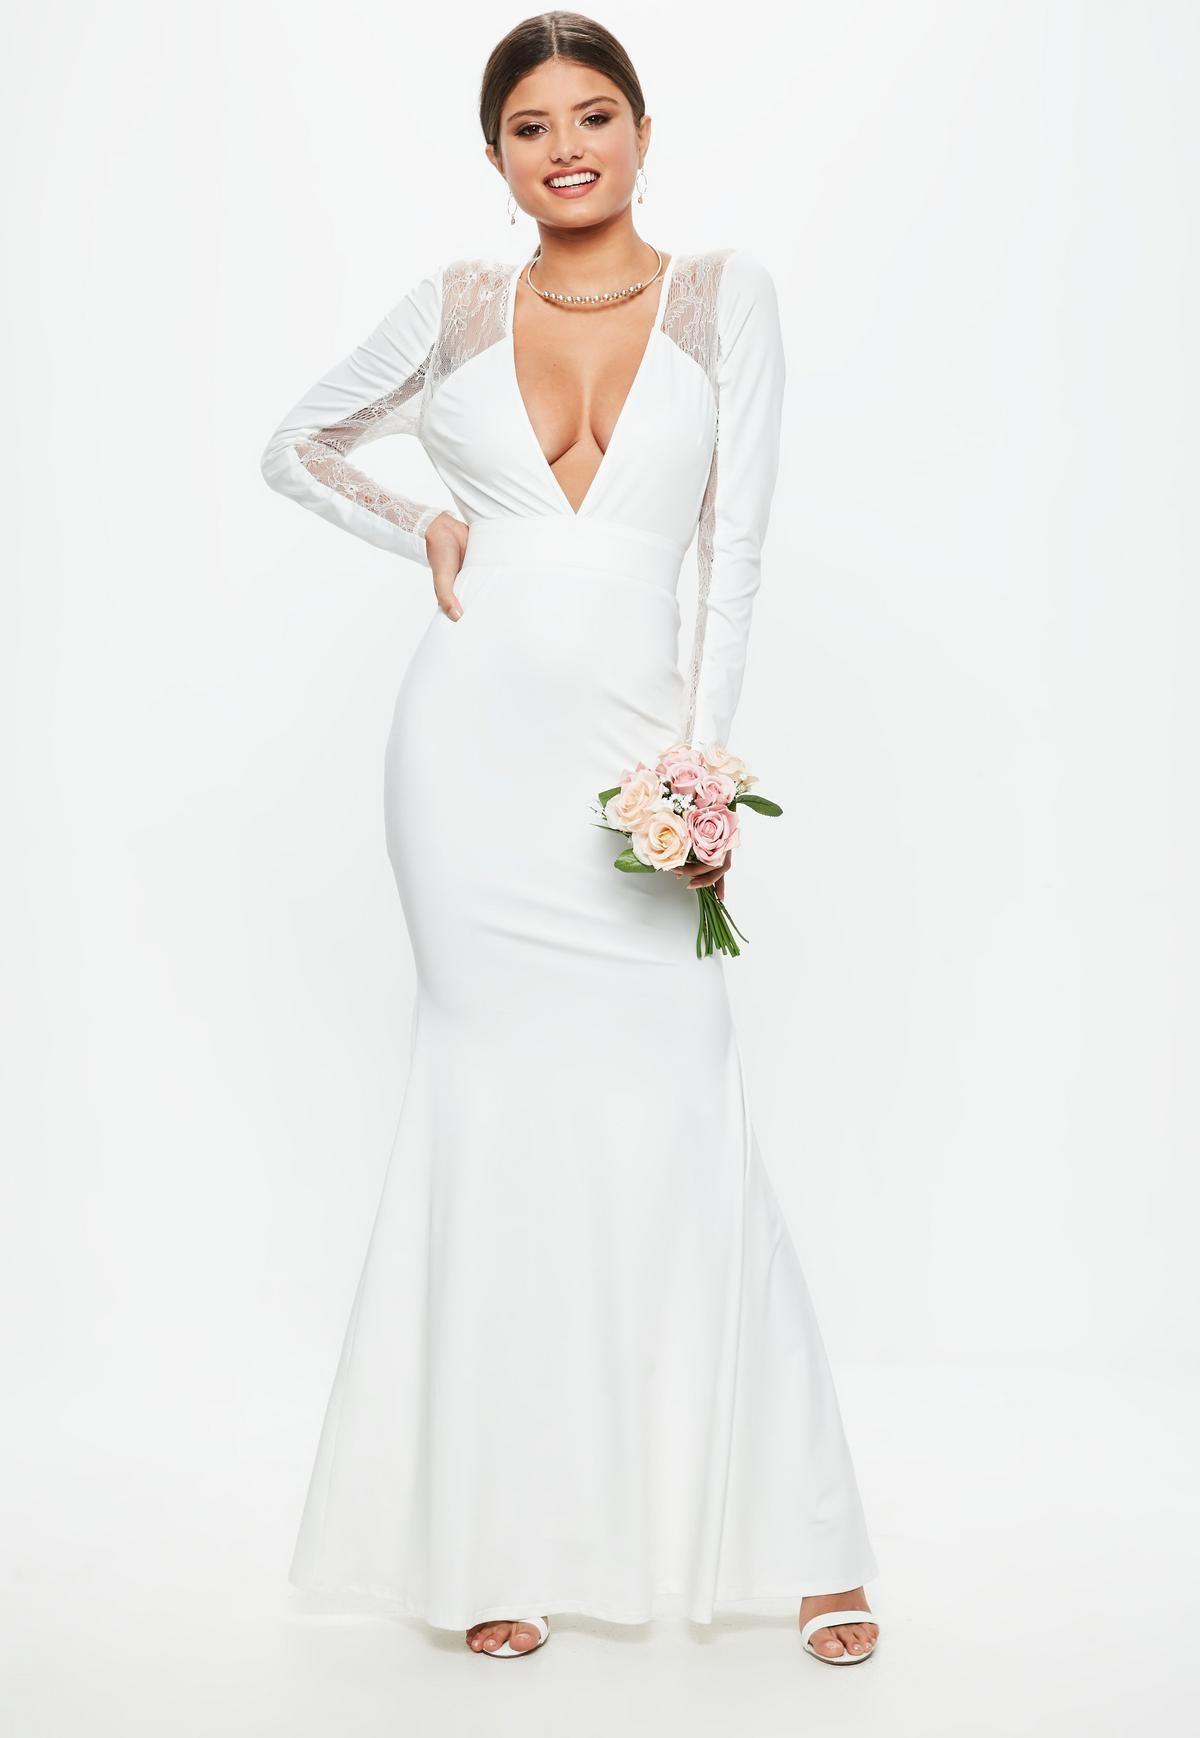 Bridal White Long Sleeve Plunge Open Back Lace Insert Maxi Dress Missguided Formal Dresses Short Tight Dresses Trending Dresses [ 1738 x 1200 Pixel ]